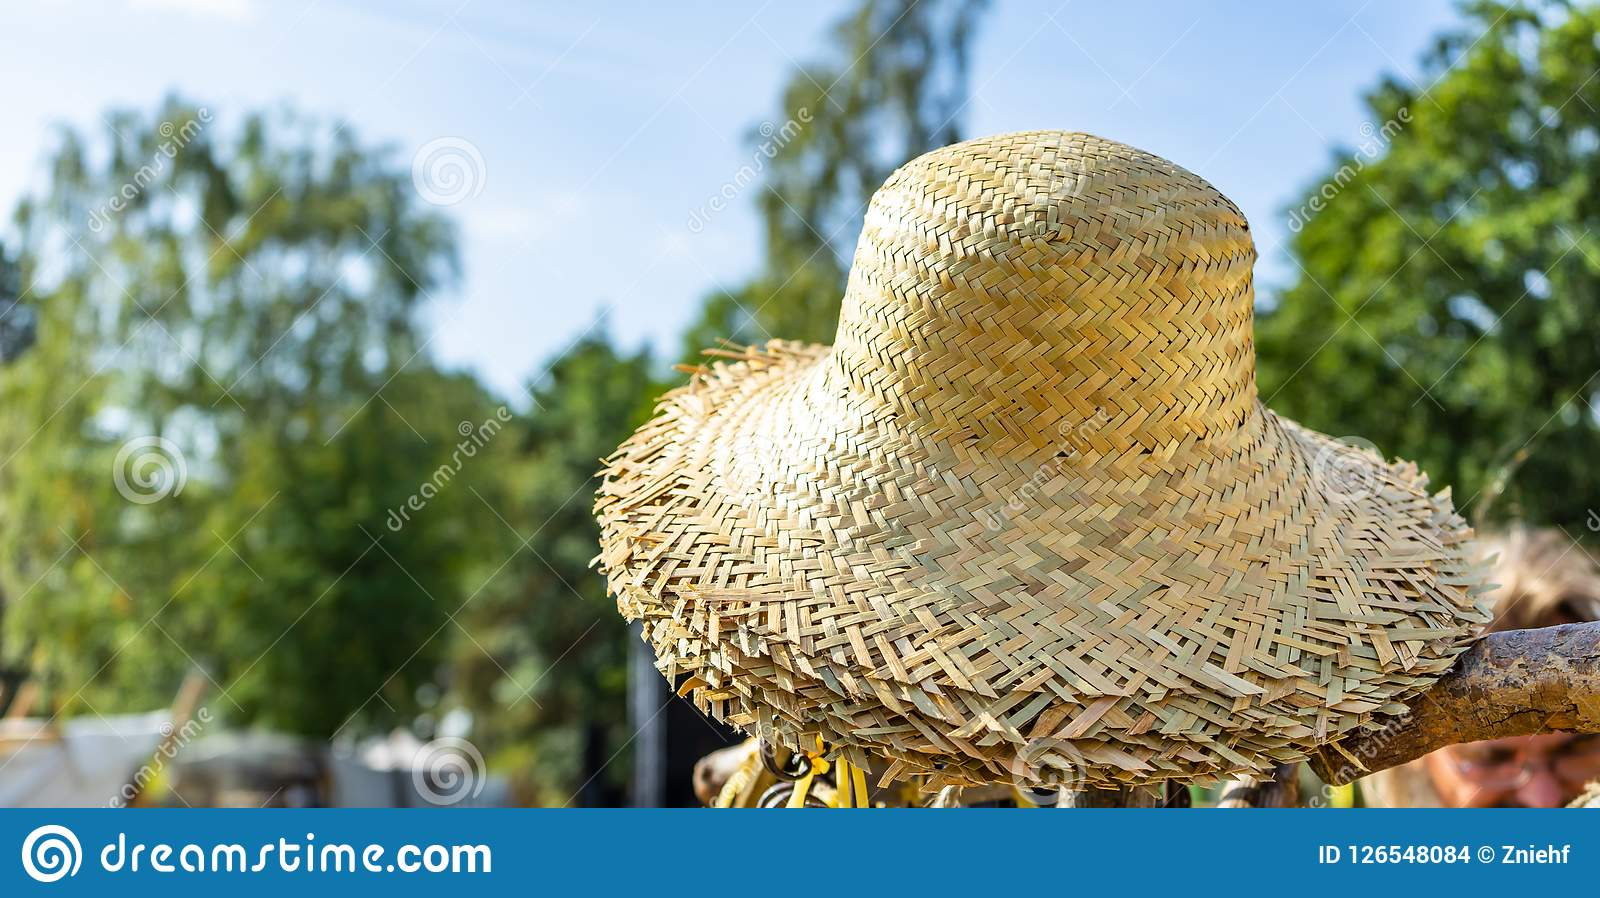 e24fe1e0 Where To Buy Straw Hats Near Me